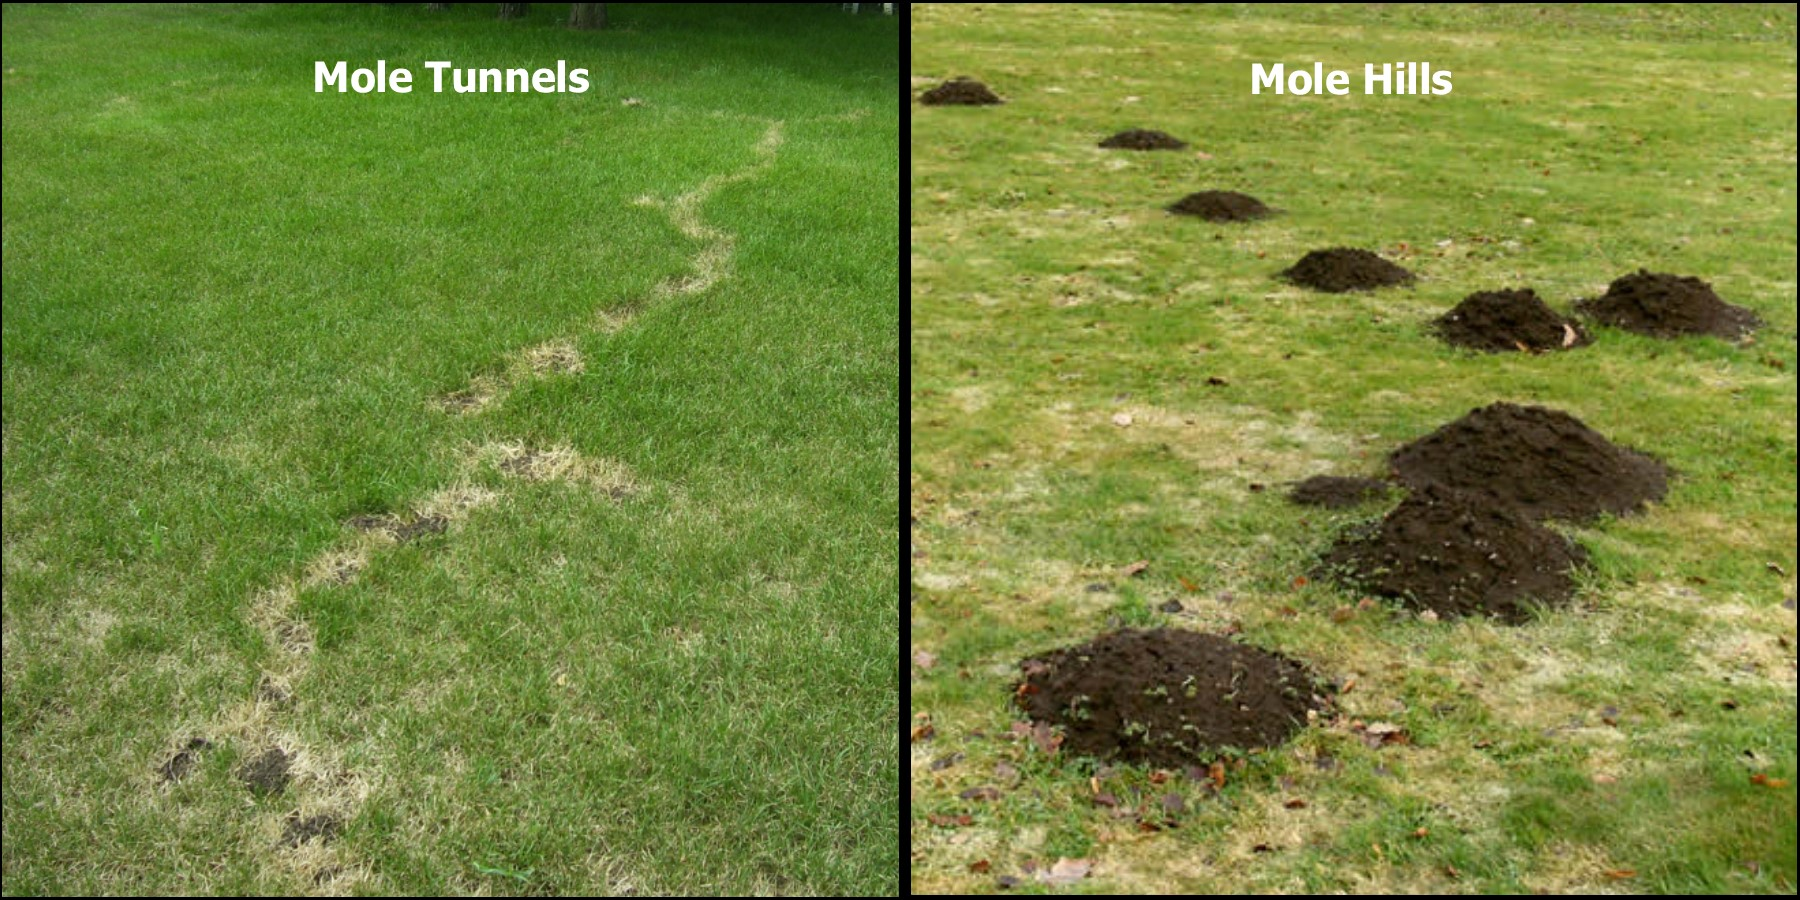 Mole tunnels and mole hills